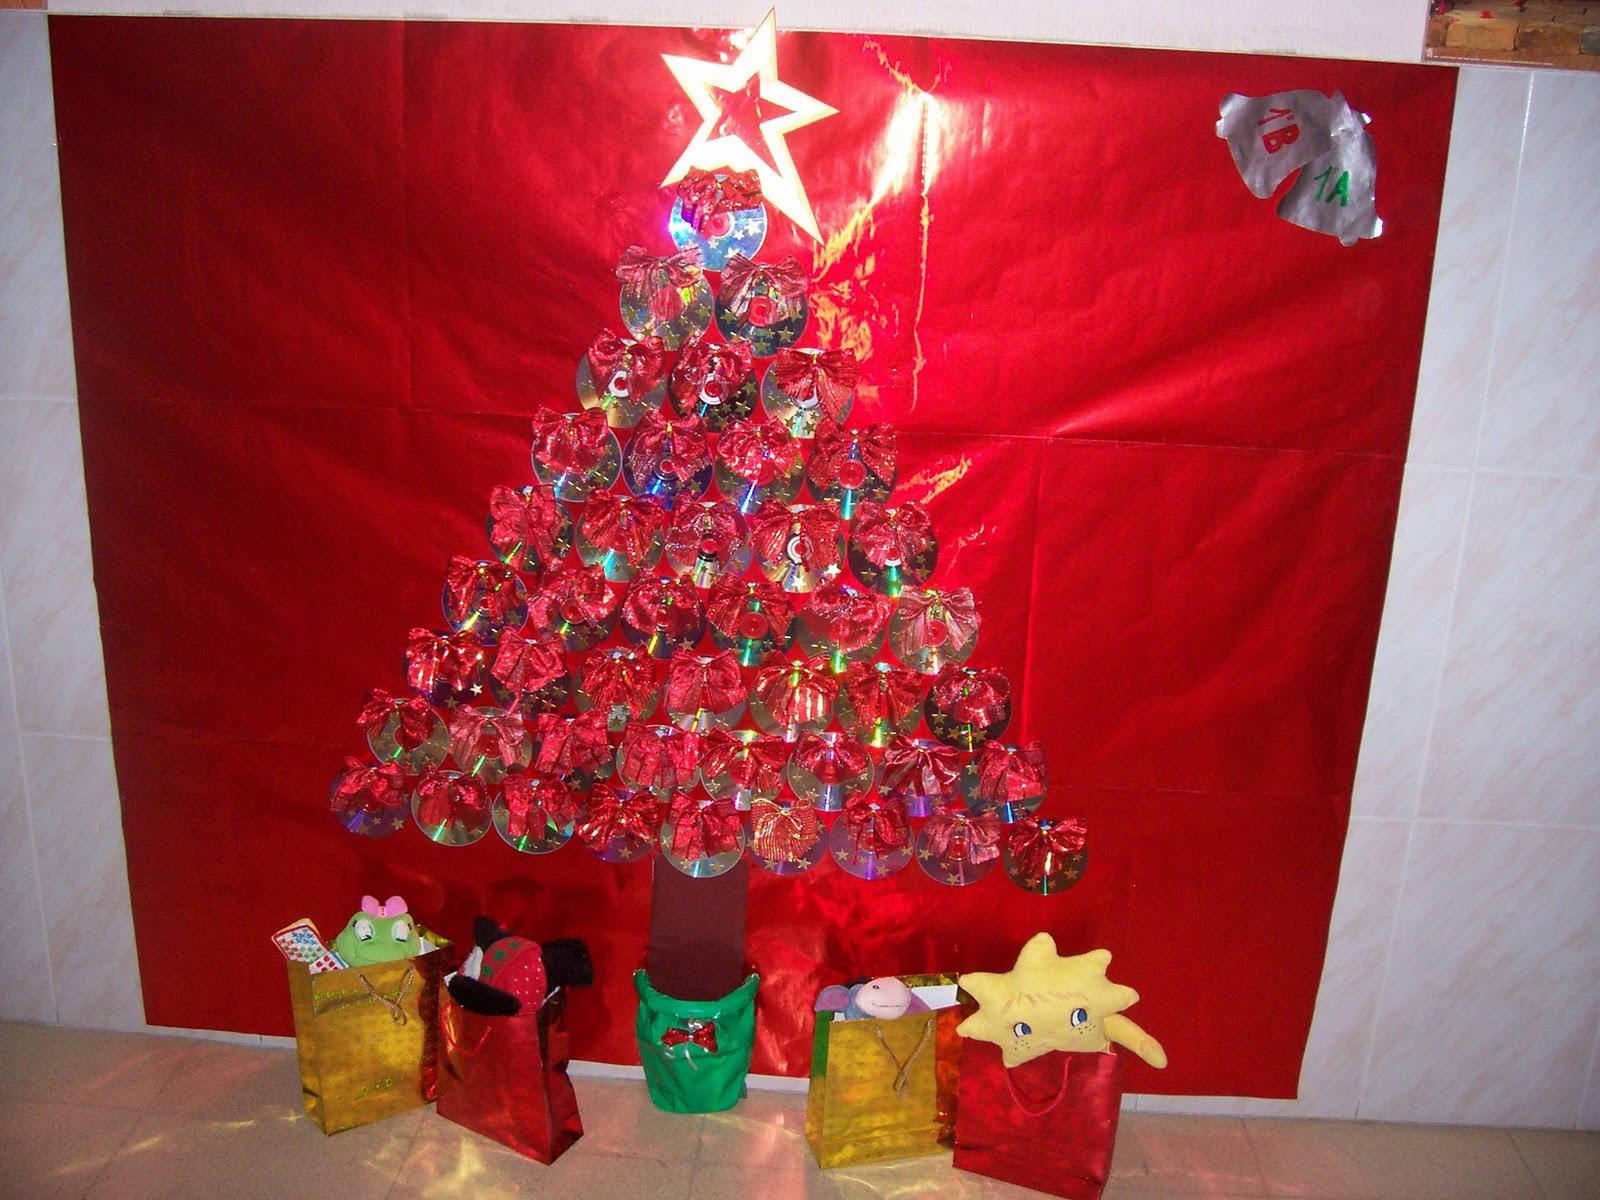 A m p a colegio san francisco coll albacete educaci n - Decoracion navidad infantil ...